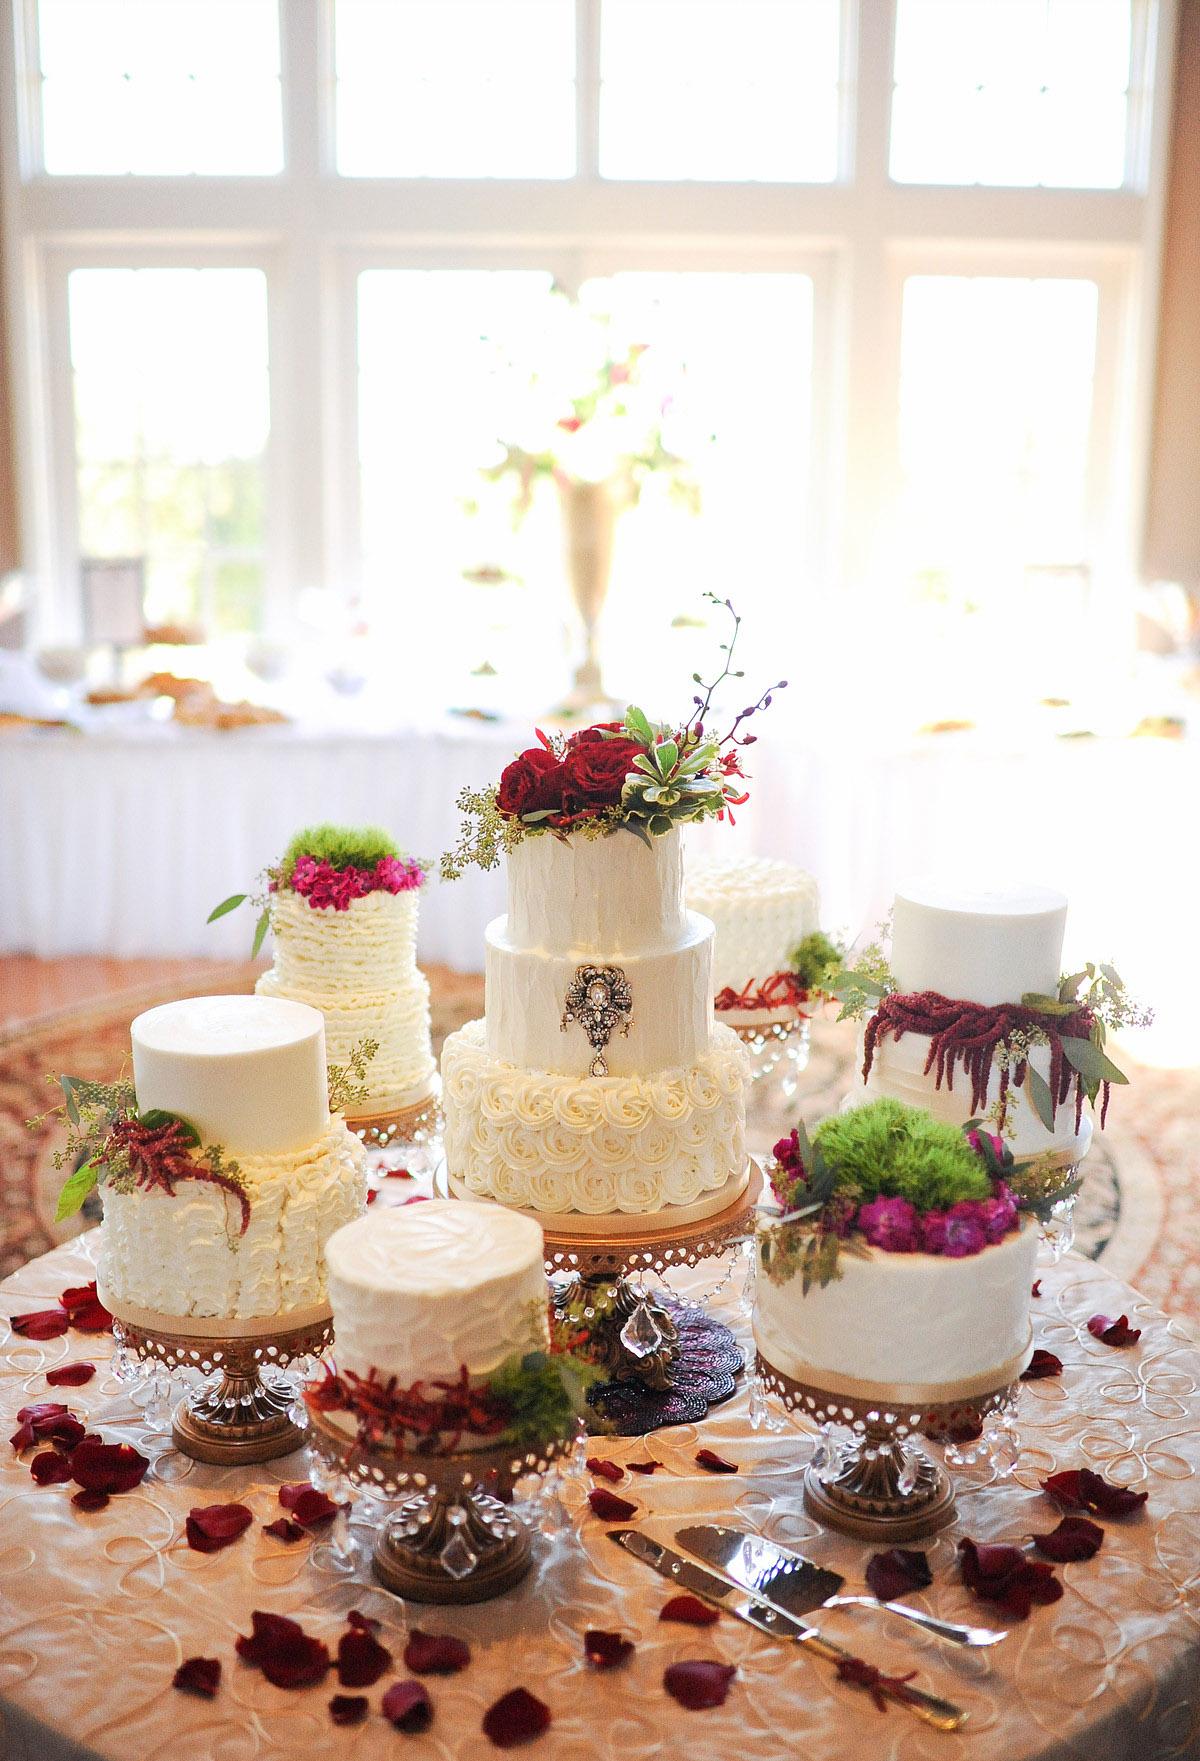 fall-wedding-caketable-opulent-treasures-shingleurphotography.jpg